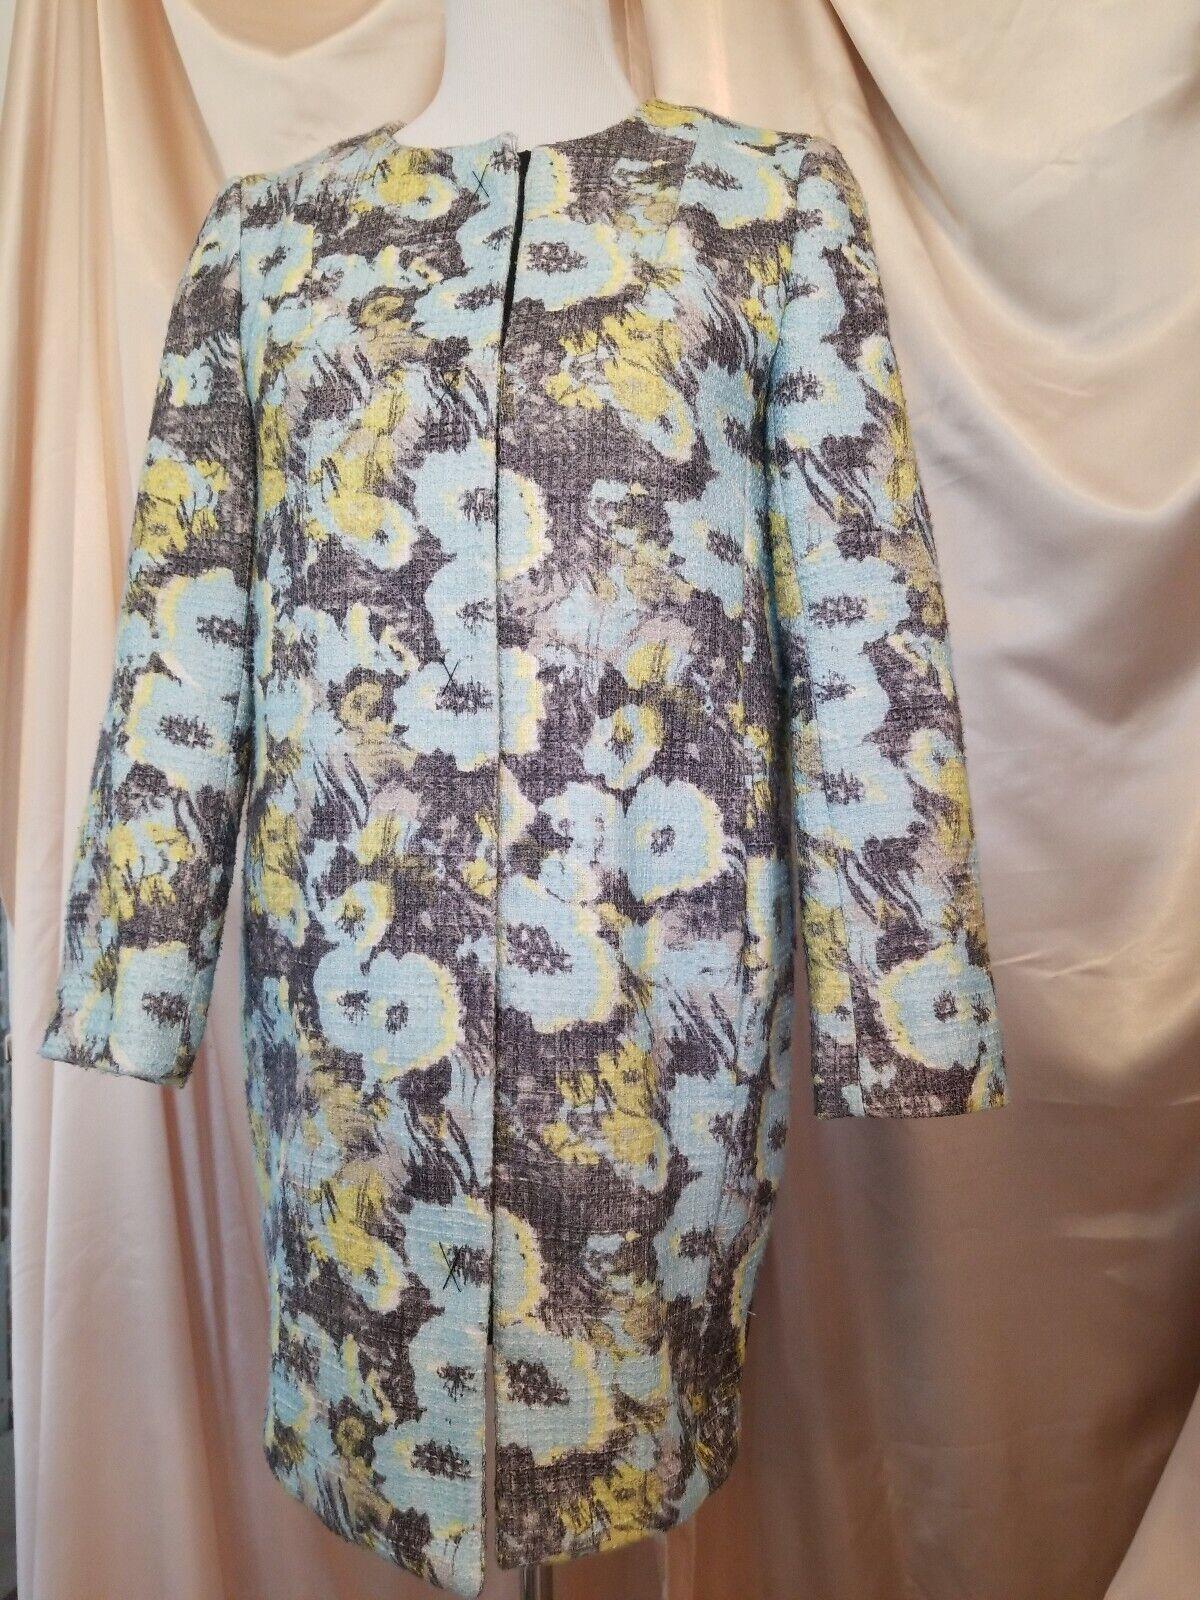 Topshop Robin Egg Blue Neon Yellow Grey Womens Dress Coat Snap Up Sz 2